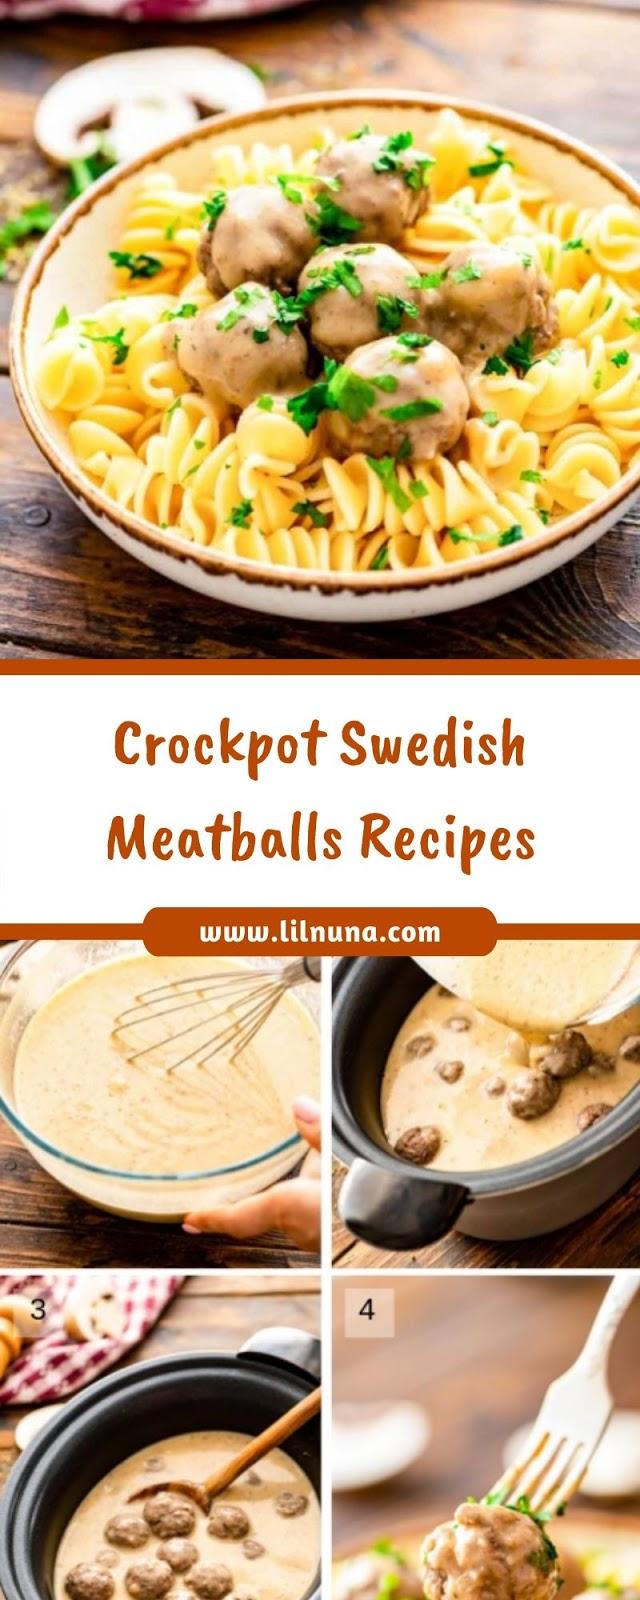 Crockpot Swedish Meatballs Recipes